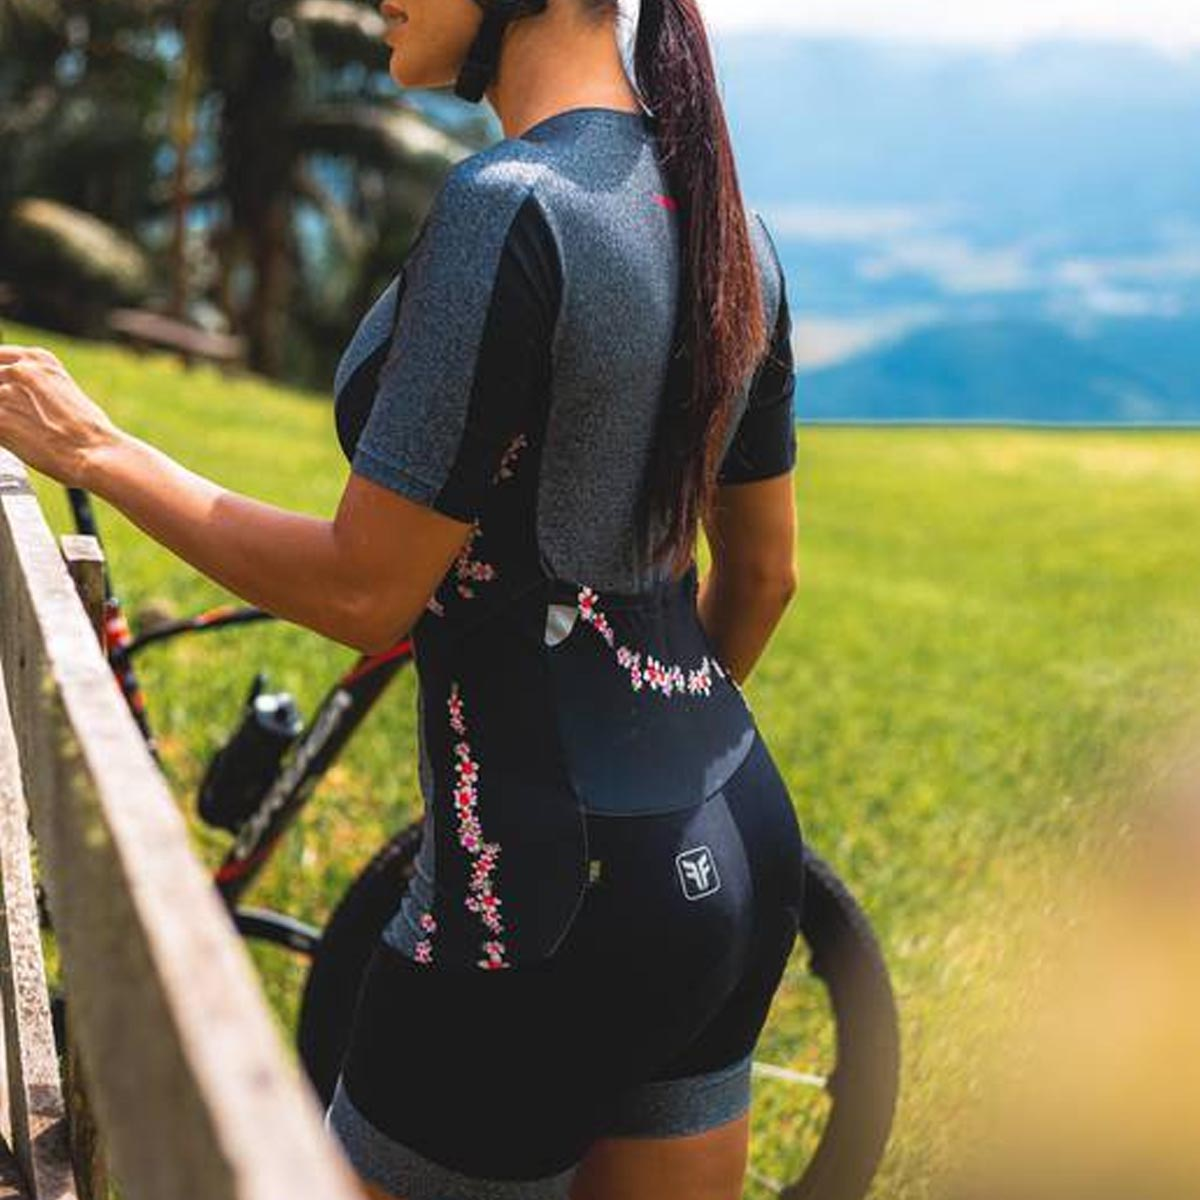 Macaquinho Freeforce Feminino New Euphoria Preto e Cinza Mescla Forro Invert Gel Ciclismo 21